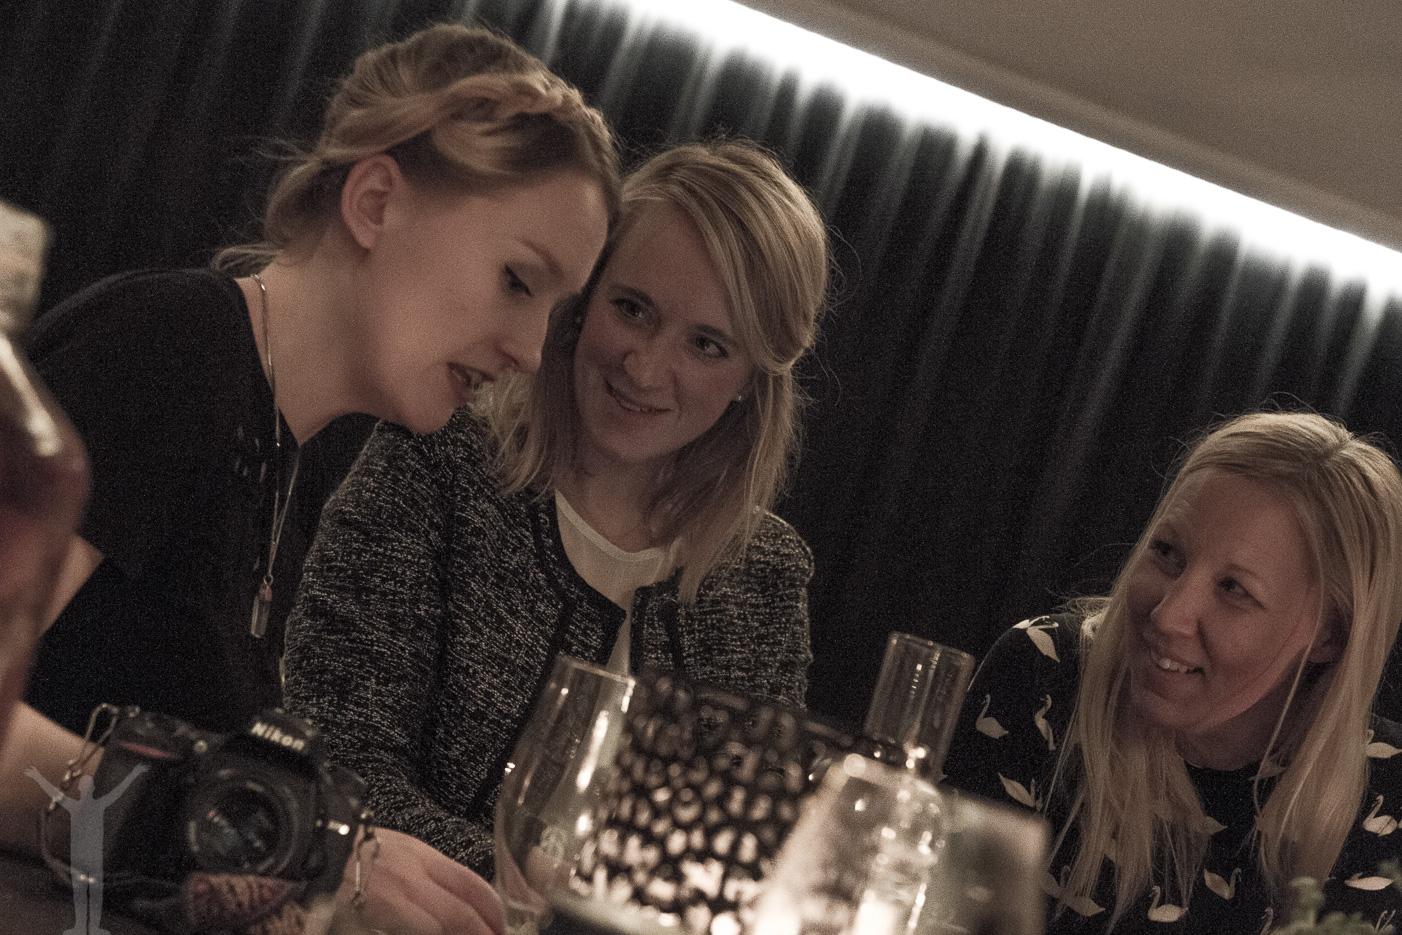 Jeanette Seflin, Annika på Resfredag och Towe på Come fly with me.